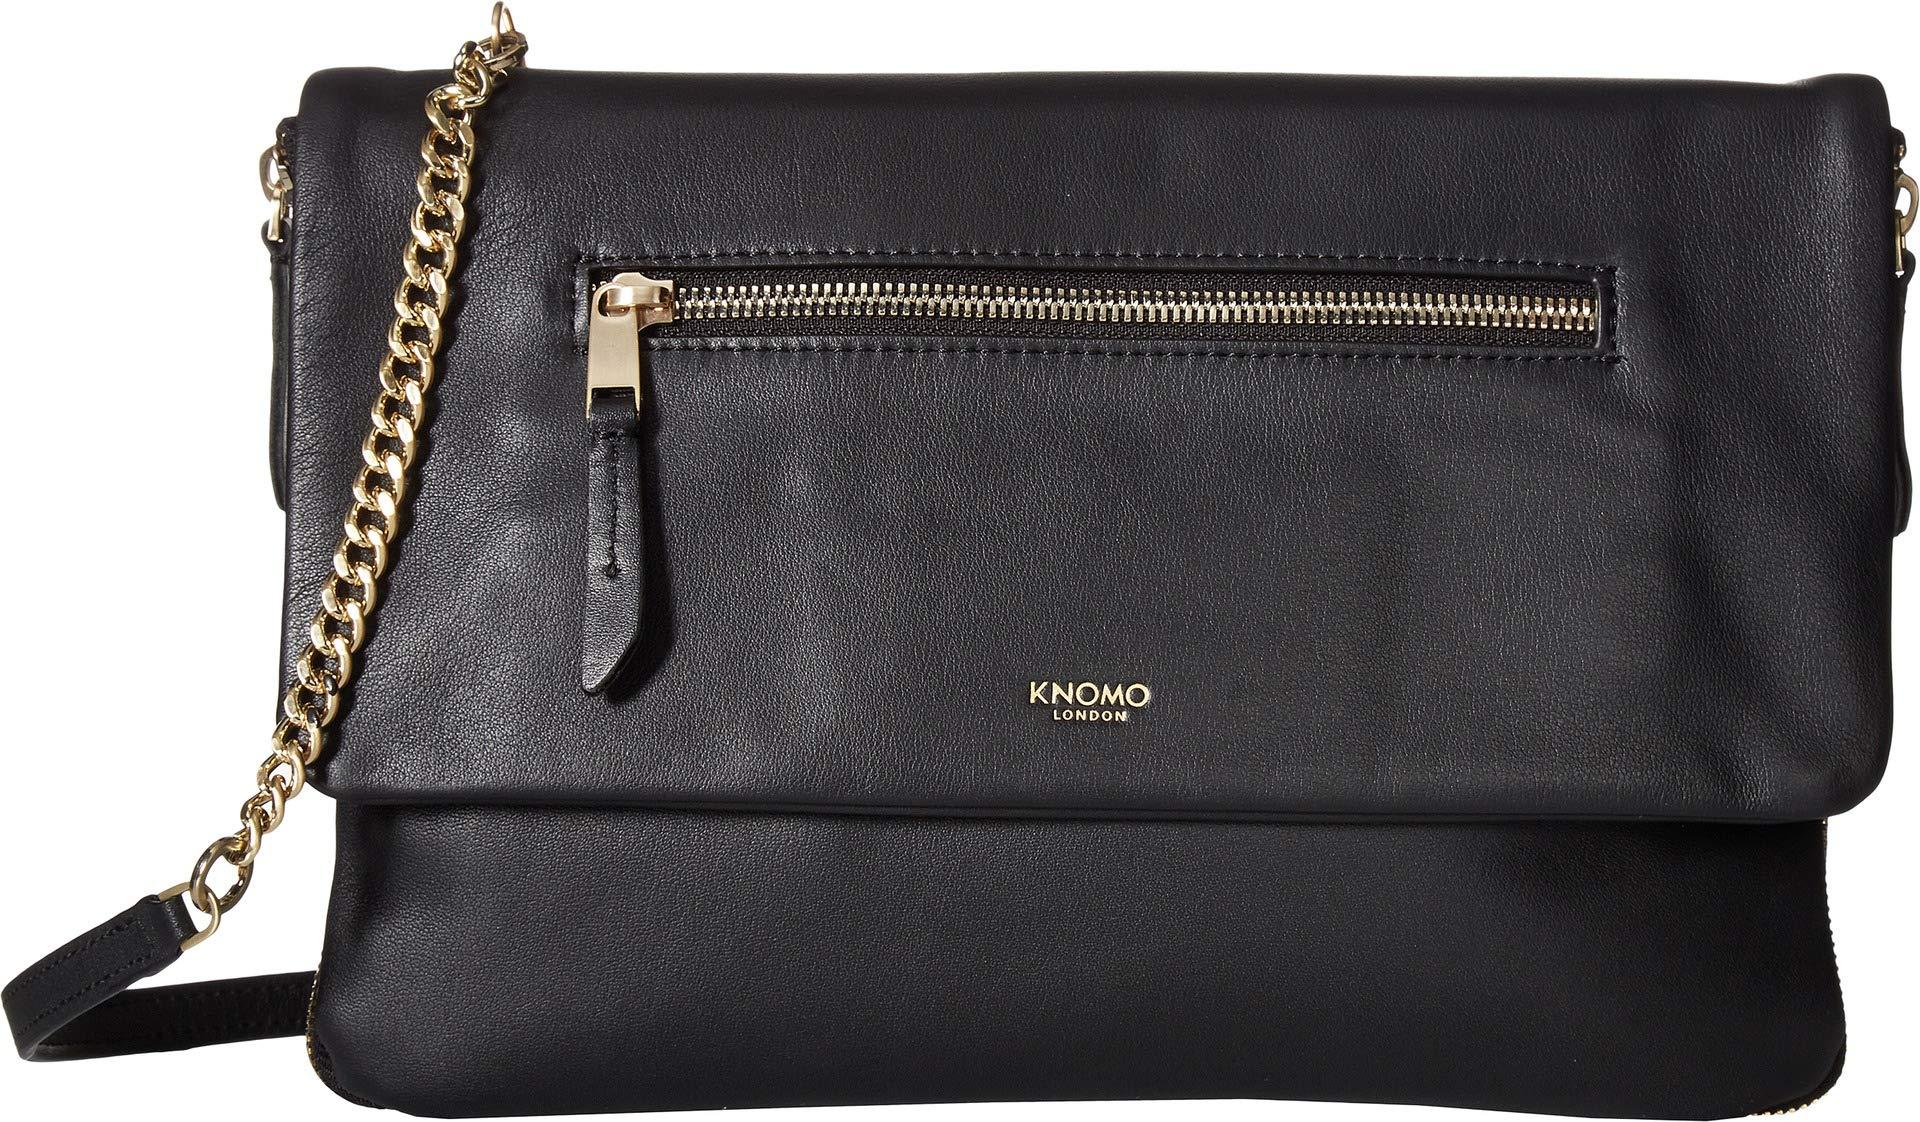 Knomo London Mayfair Luxe Elektronista Leather Digital Clutch / Shoulder Bag 10'' (No Power) (Black)